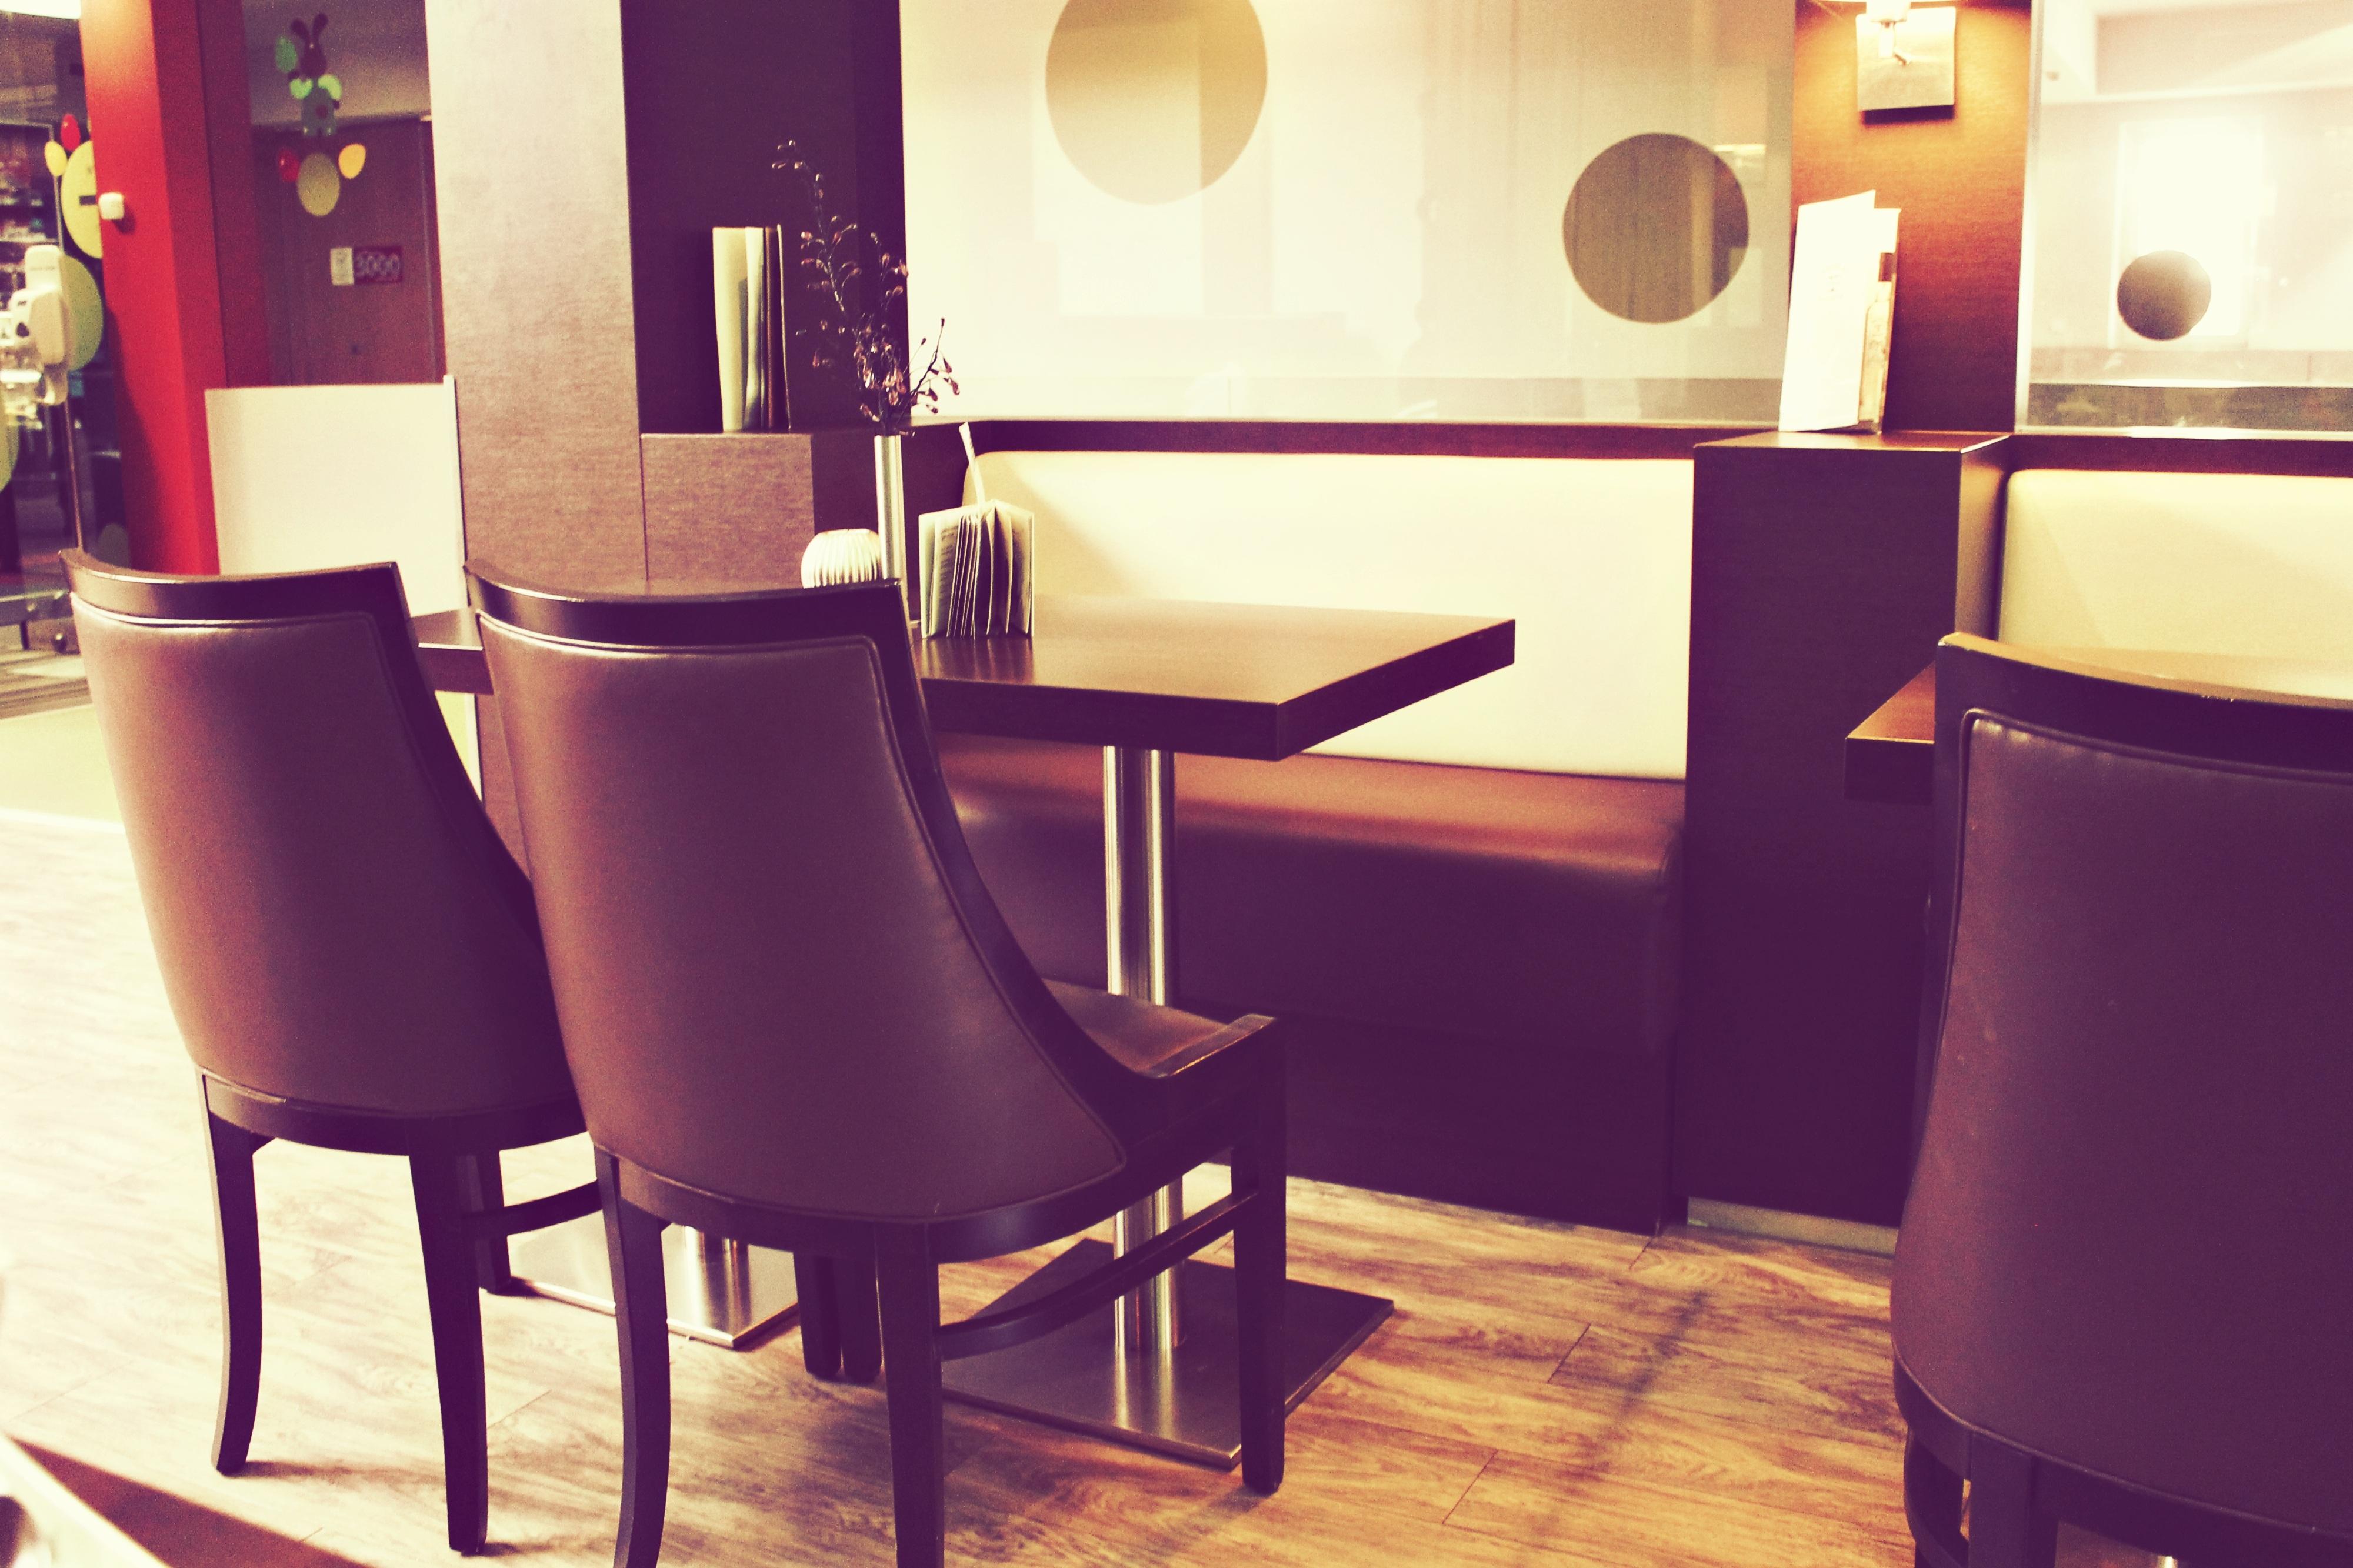 Gambar Meja Kafe Vintage Kursi Restoran Peralatan Warna